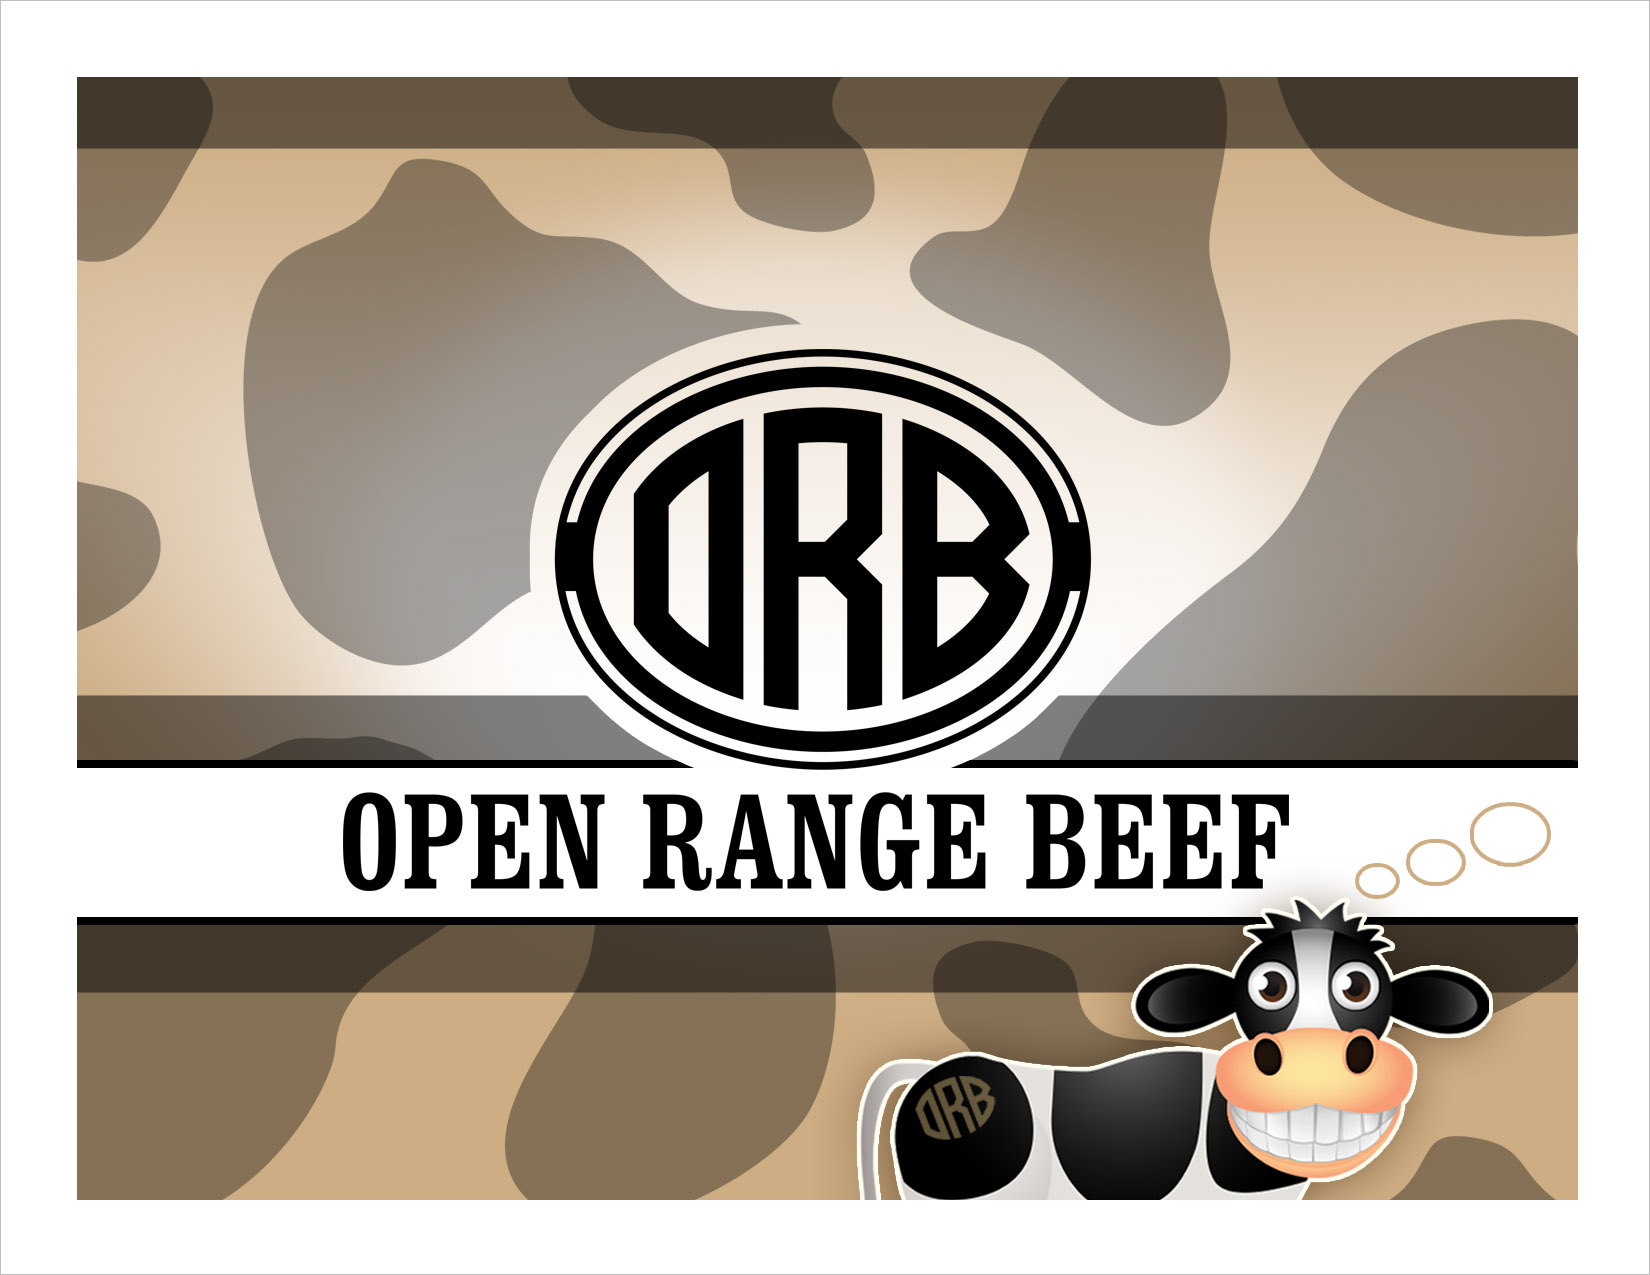 Open Range Beef Notecard Gordon, NE